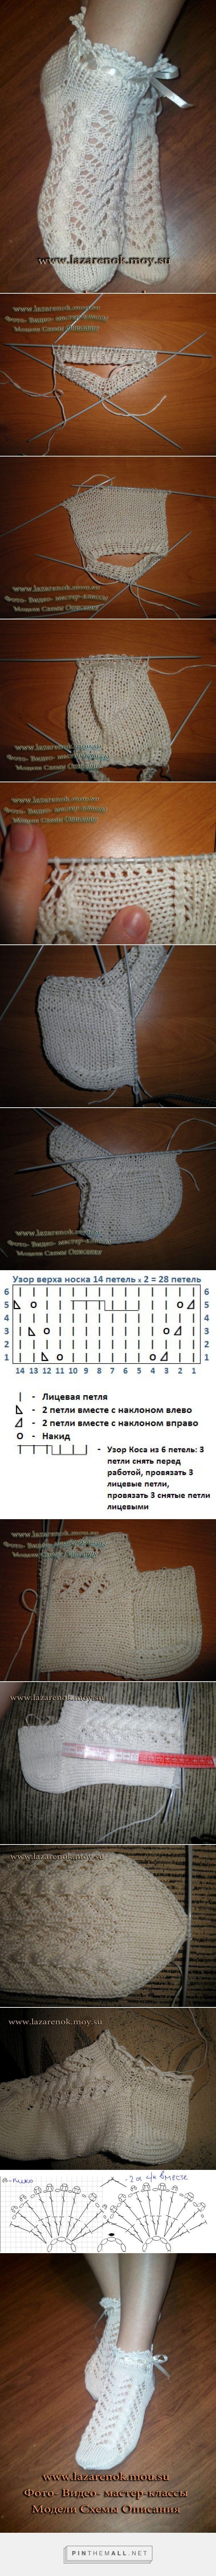 Russian Lace & Cable Anklets Step by Step (Long & detailed!) Picture Tutorial ~~ http://searchmasterclass.net/vjazanie-krjuchkom/250034-vjazanie-krjuchkom-azhurnye-nosochki.html